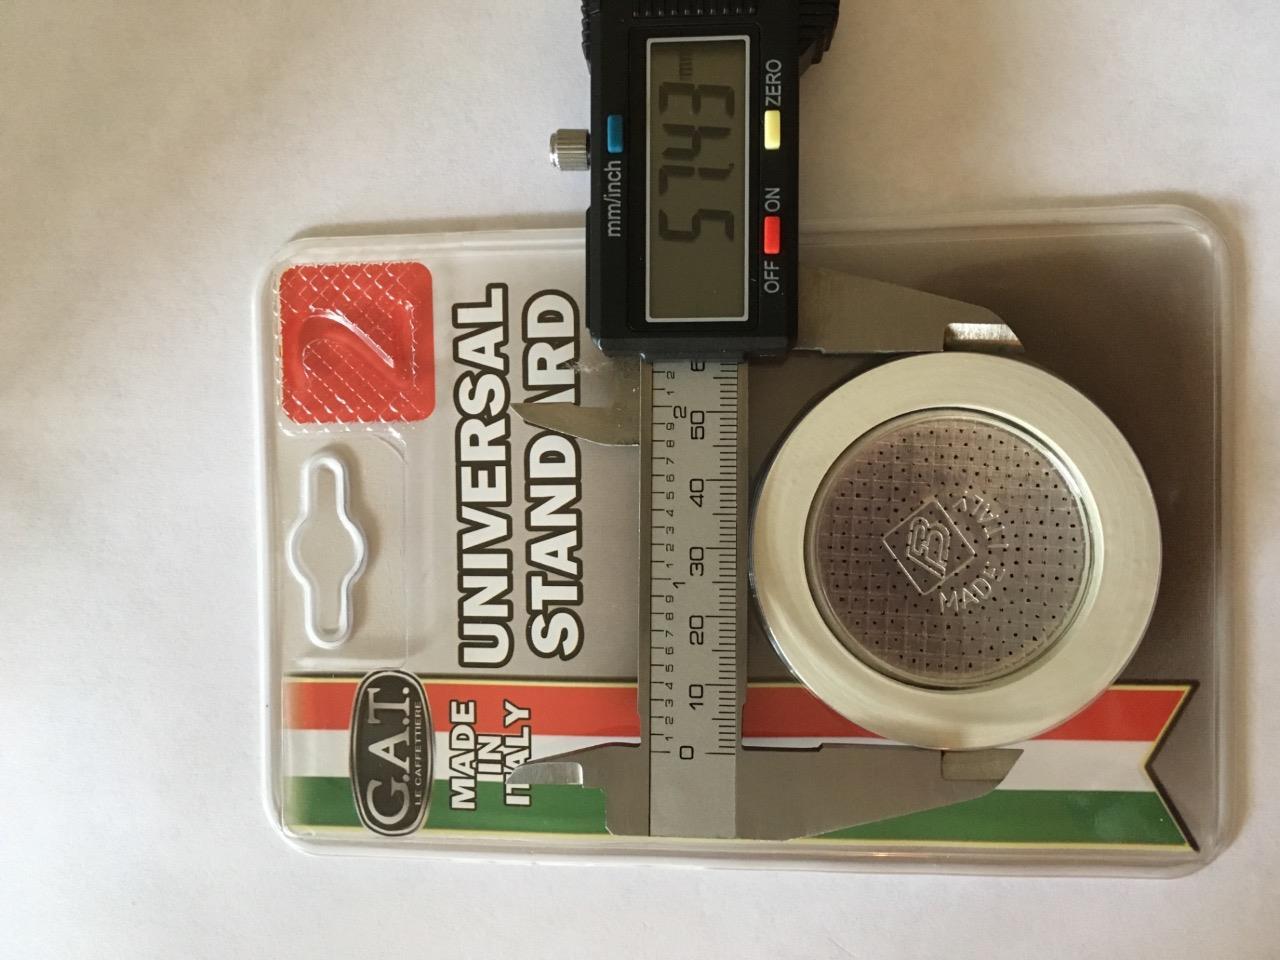 Italian Coffee Maker Seals : GAT Stovetop Espresso Maker Spare Parts Rubber Seals & Filter MADE IN ITALY! eBay